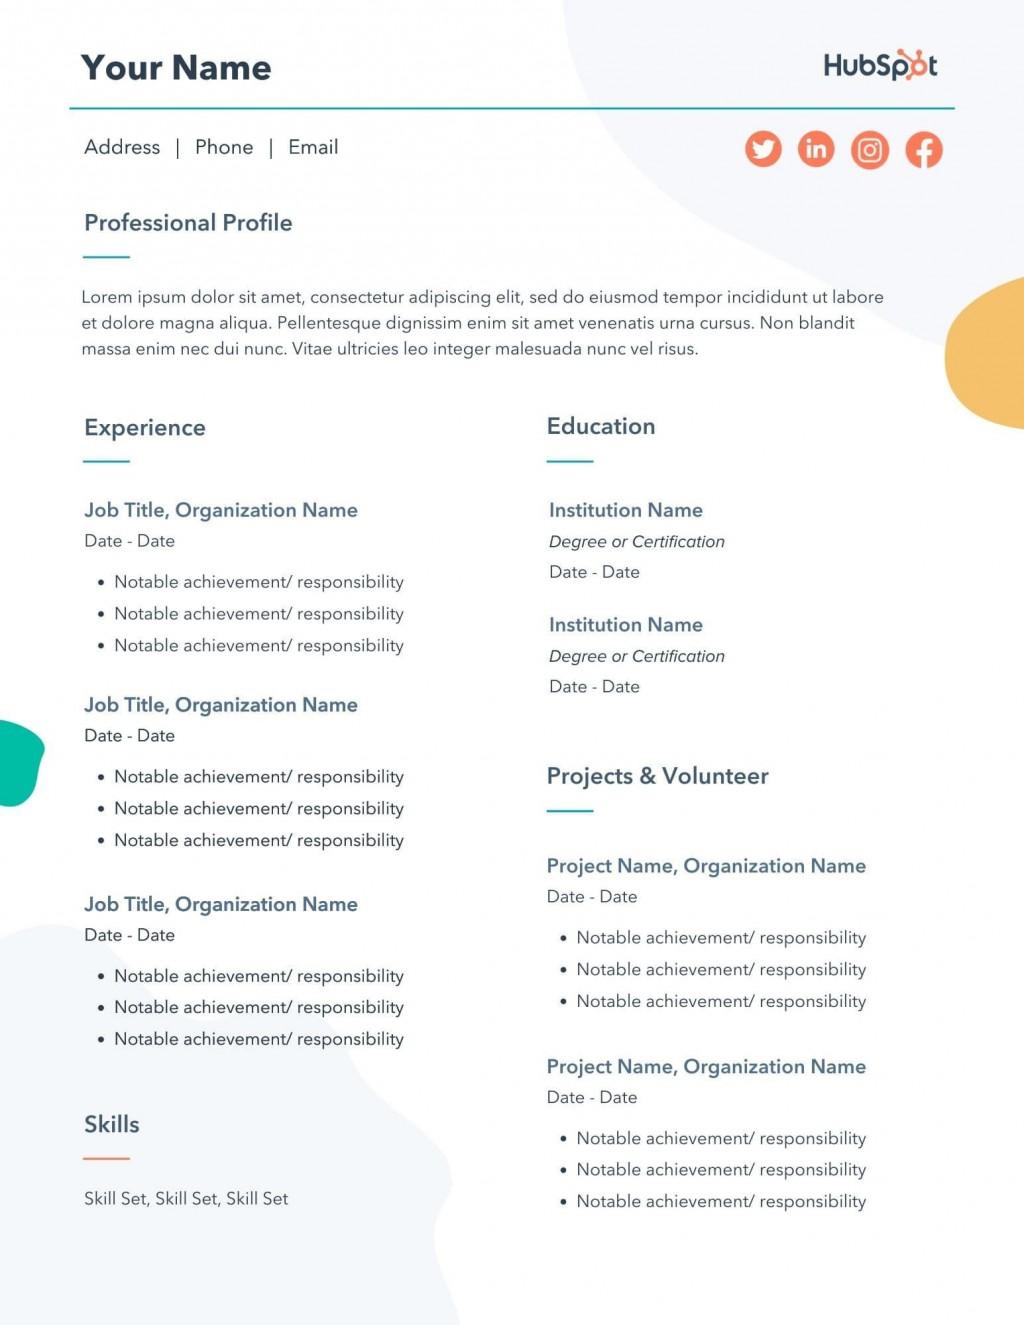 004 Impressive Resume Microsoft Word Template Inspiration  Cv/resume Design Tutorial With Federal DownloadLarge